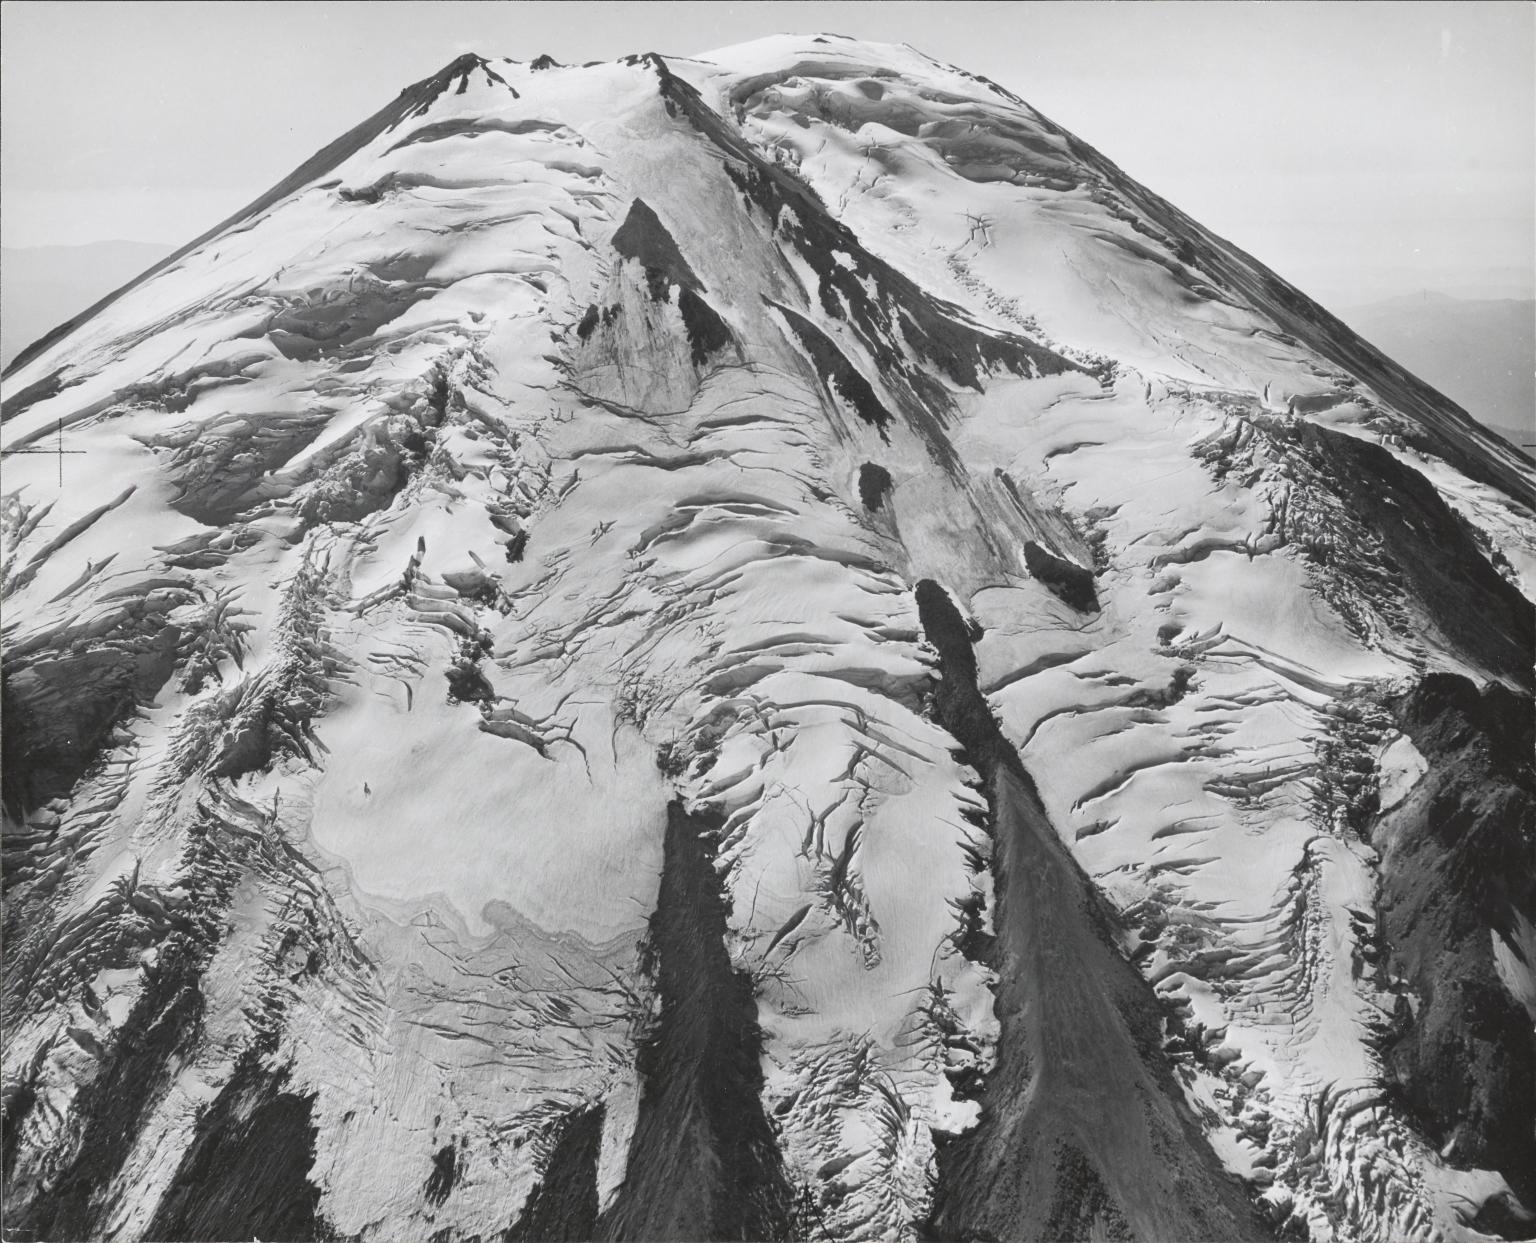 Mount Saint Helens, Washington